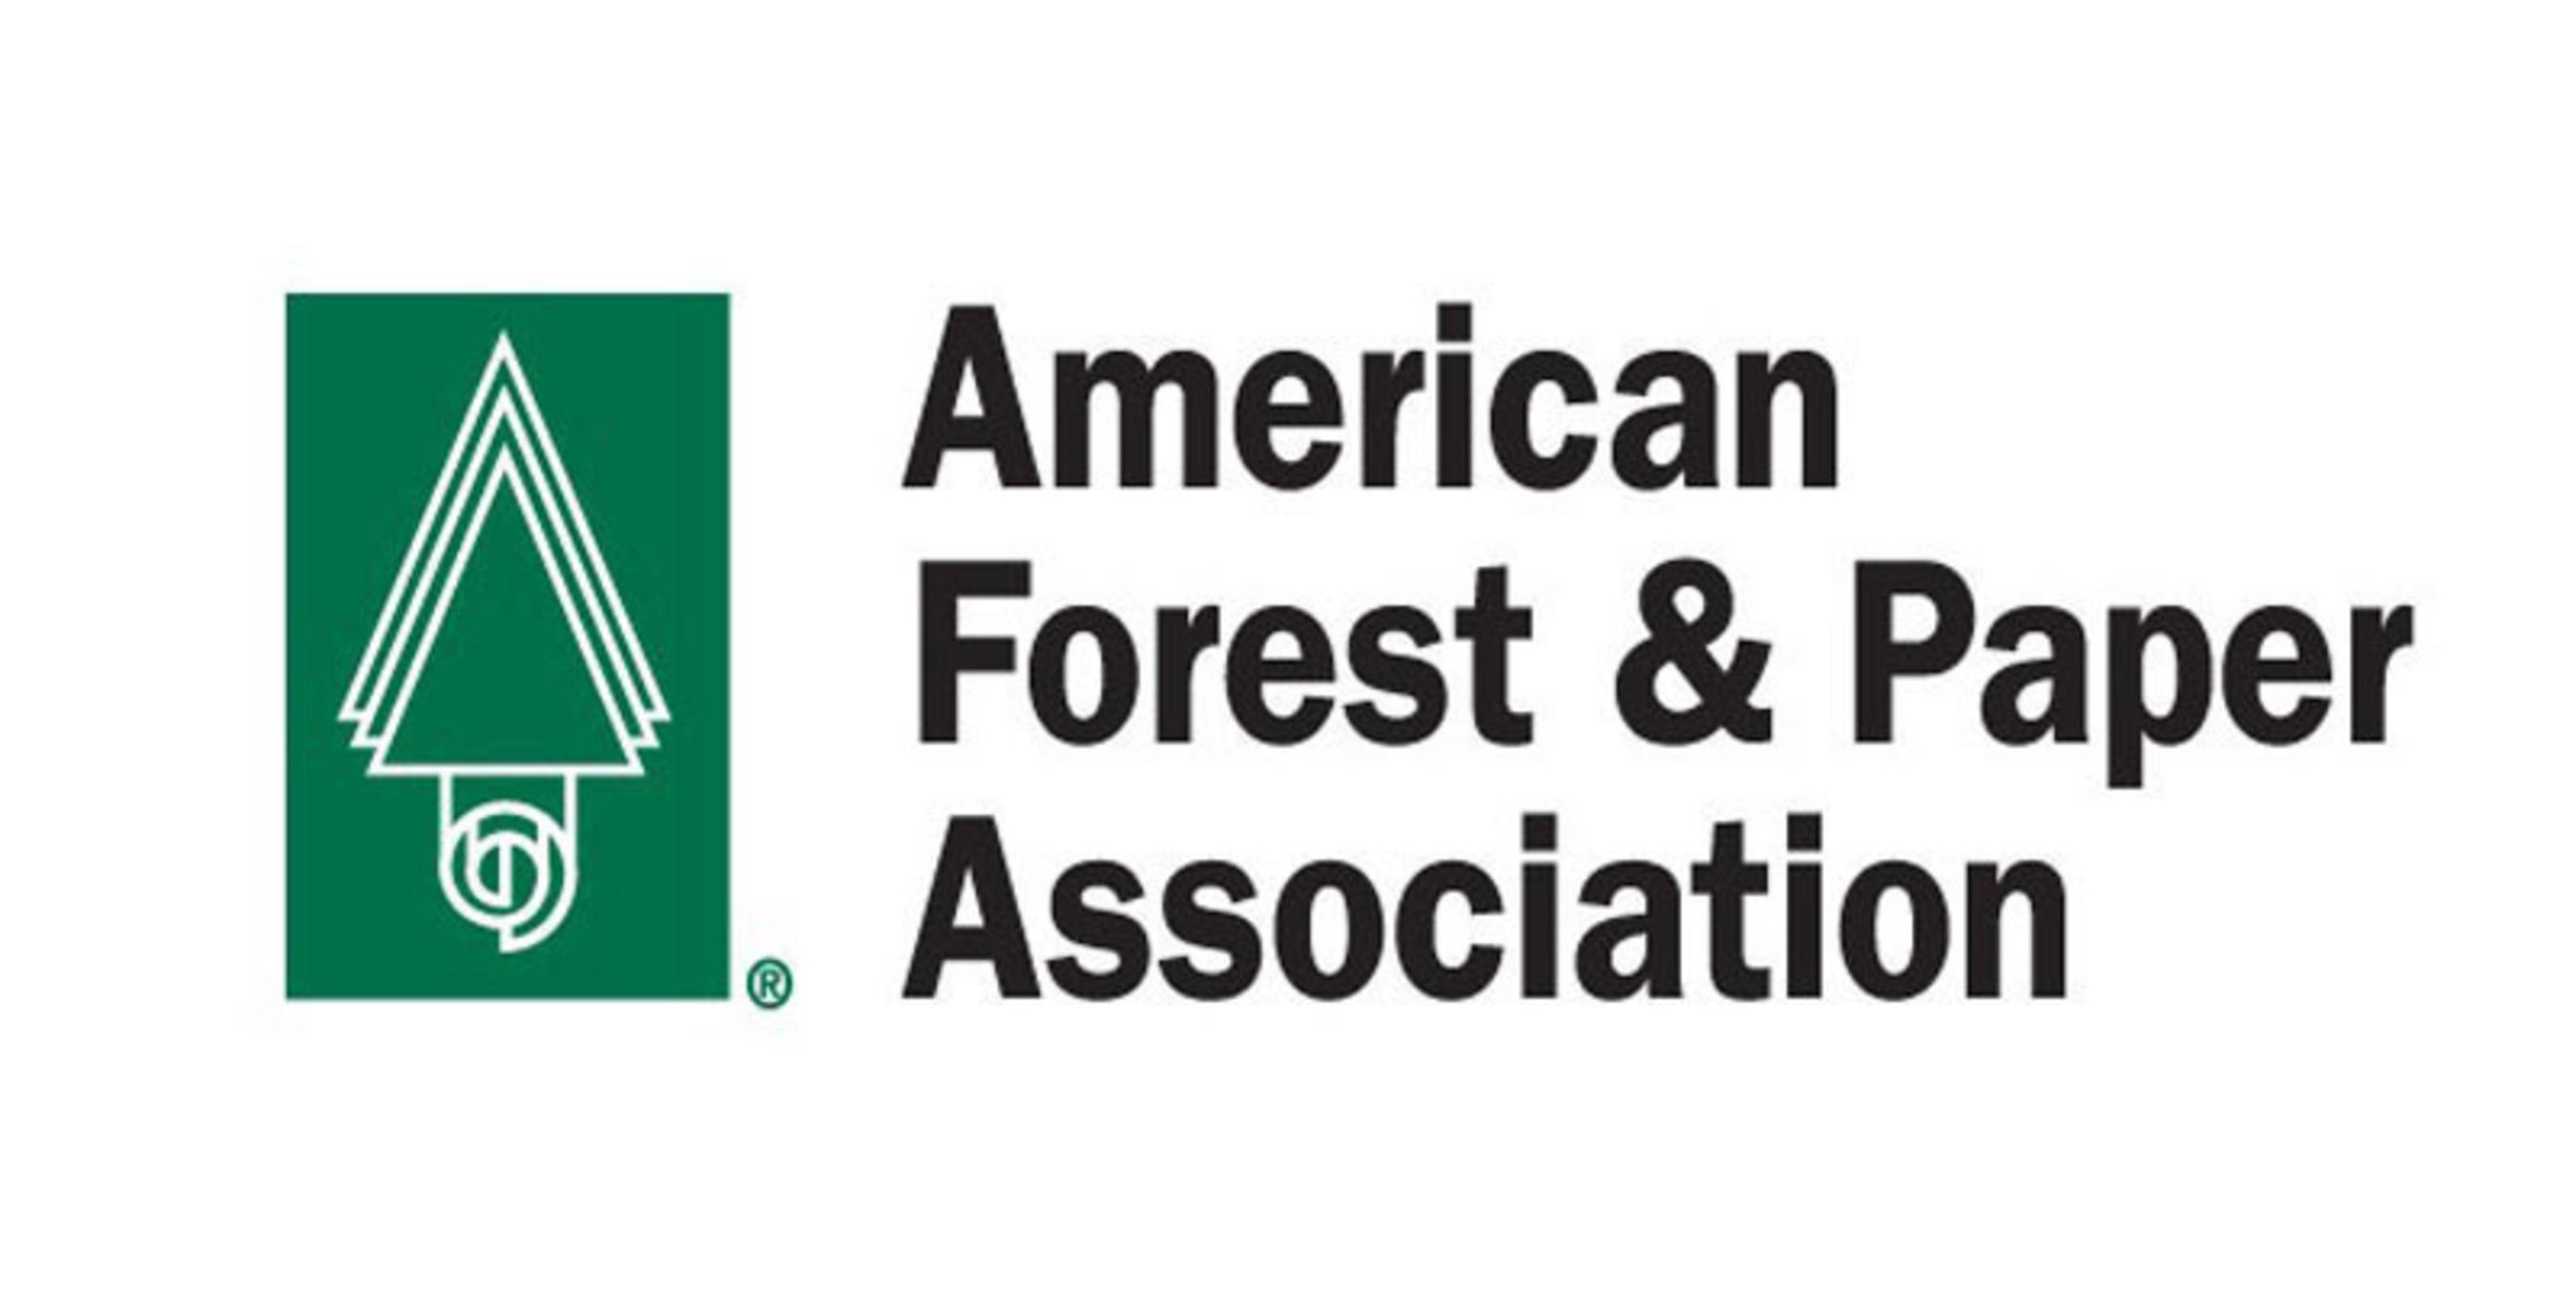 American Forest & Paper Association Logo. (PRNewsFoto/American Forest & Paper Association)